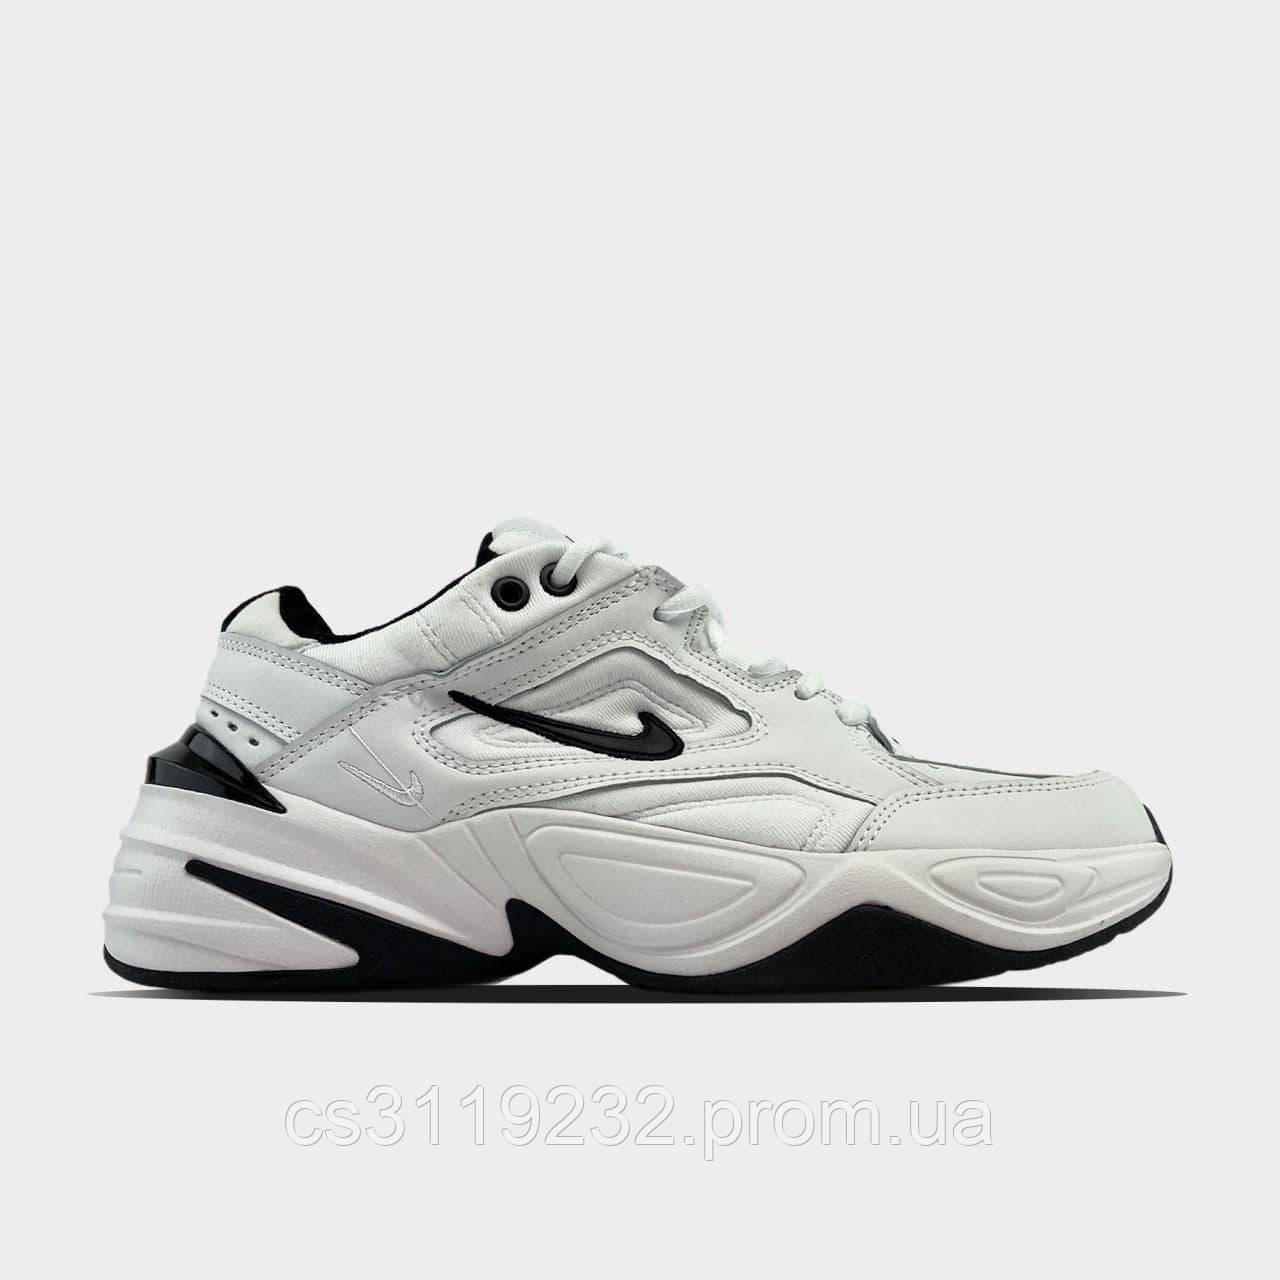 Женские кроссовки Nike M2K Tekno White Black (белые)